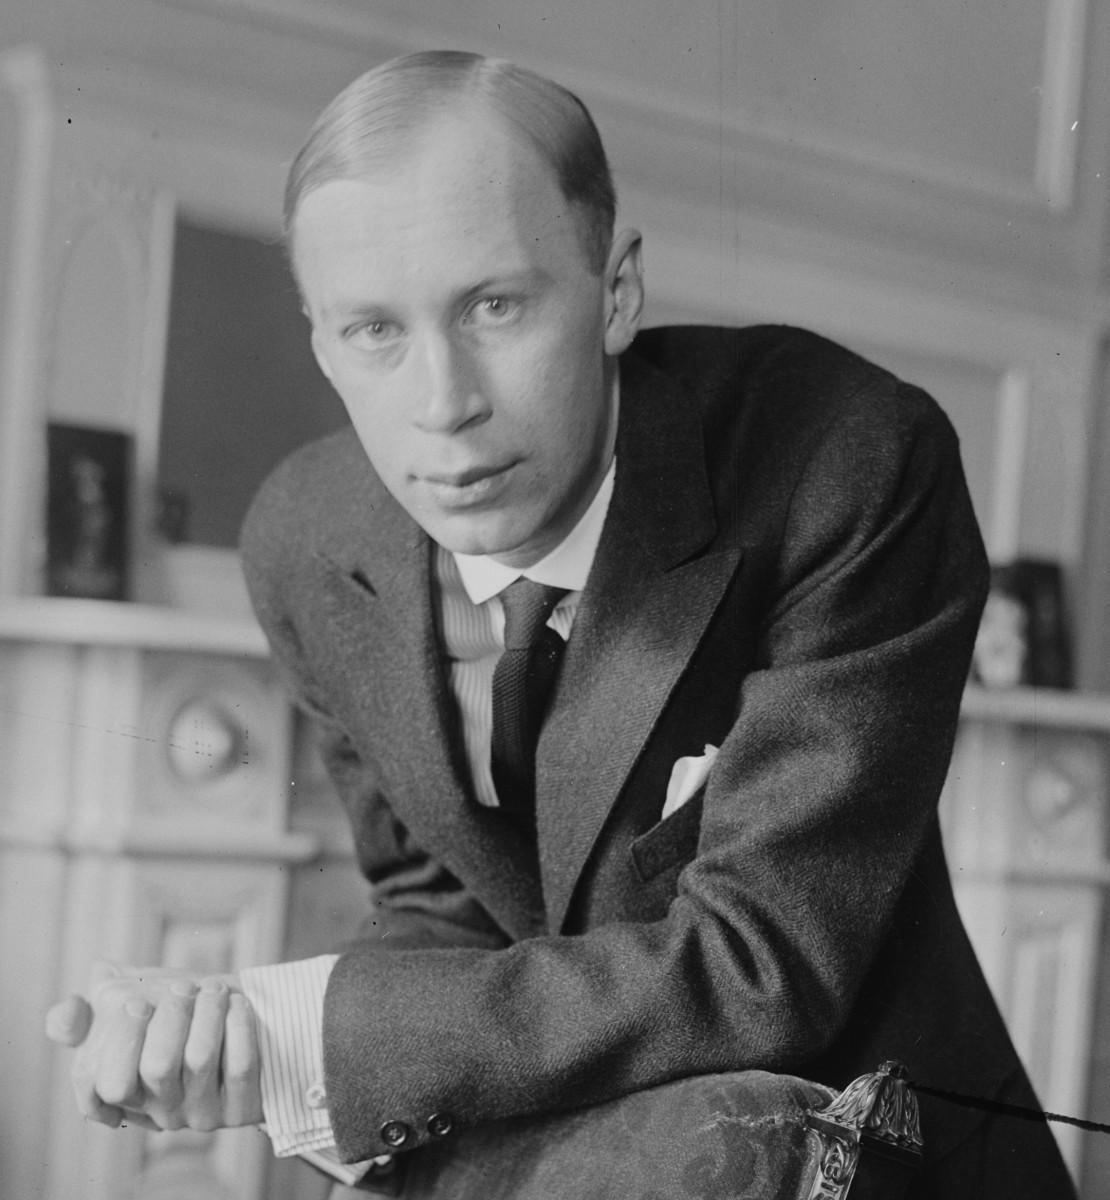 Photograph of Prokoviev c1918